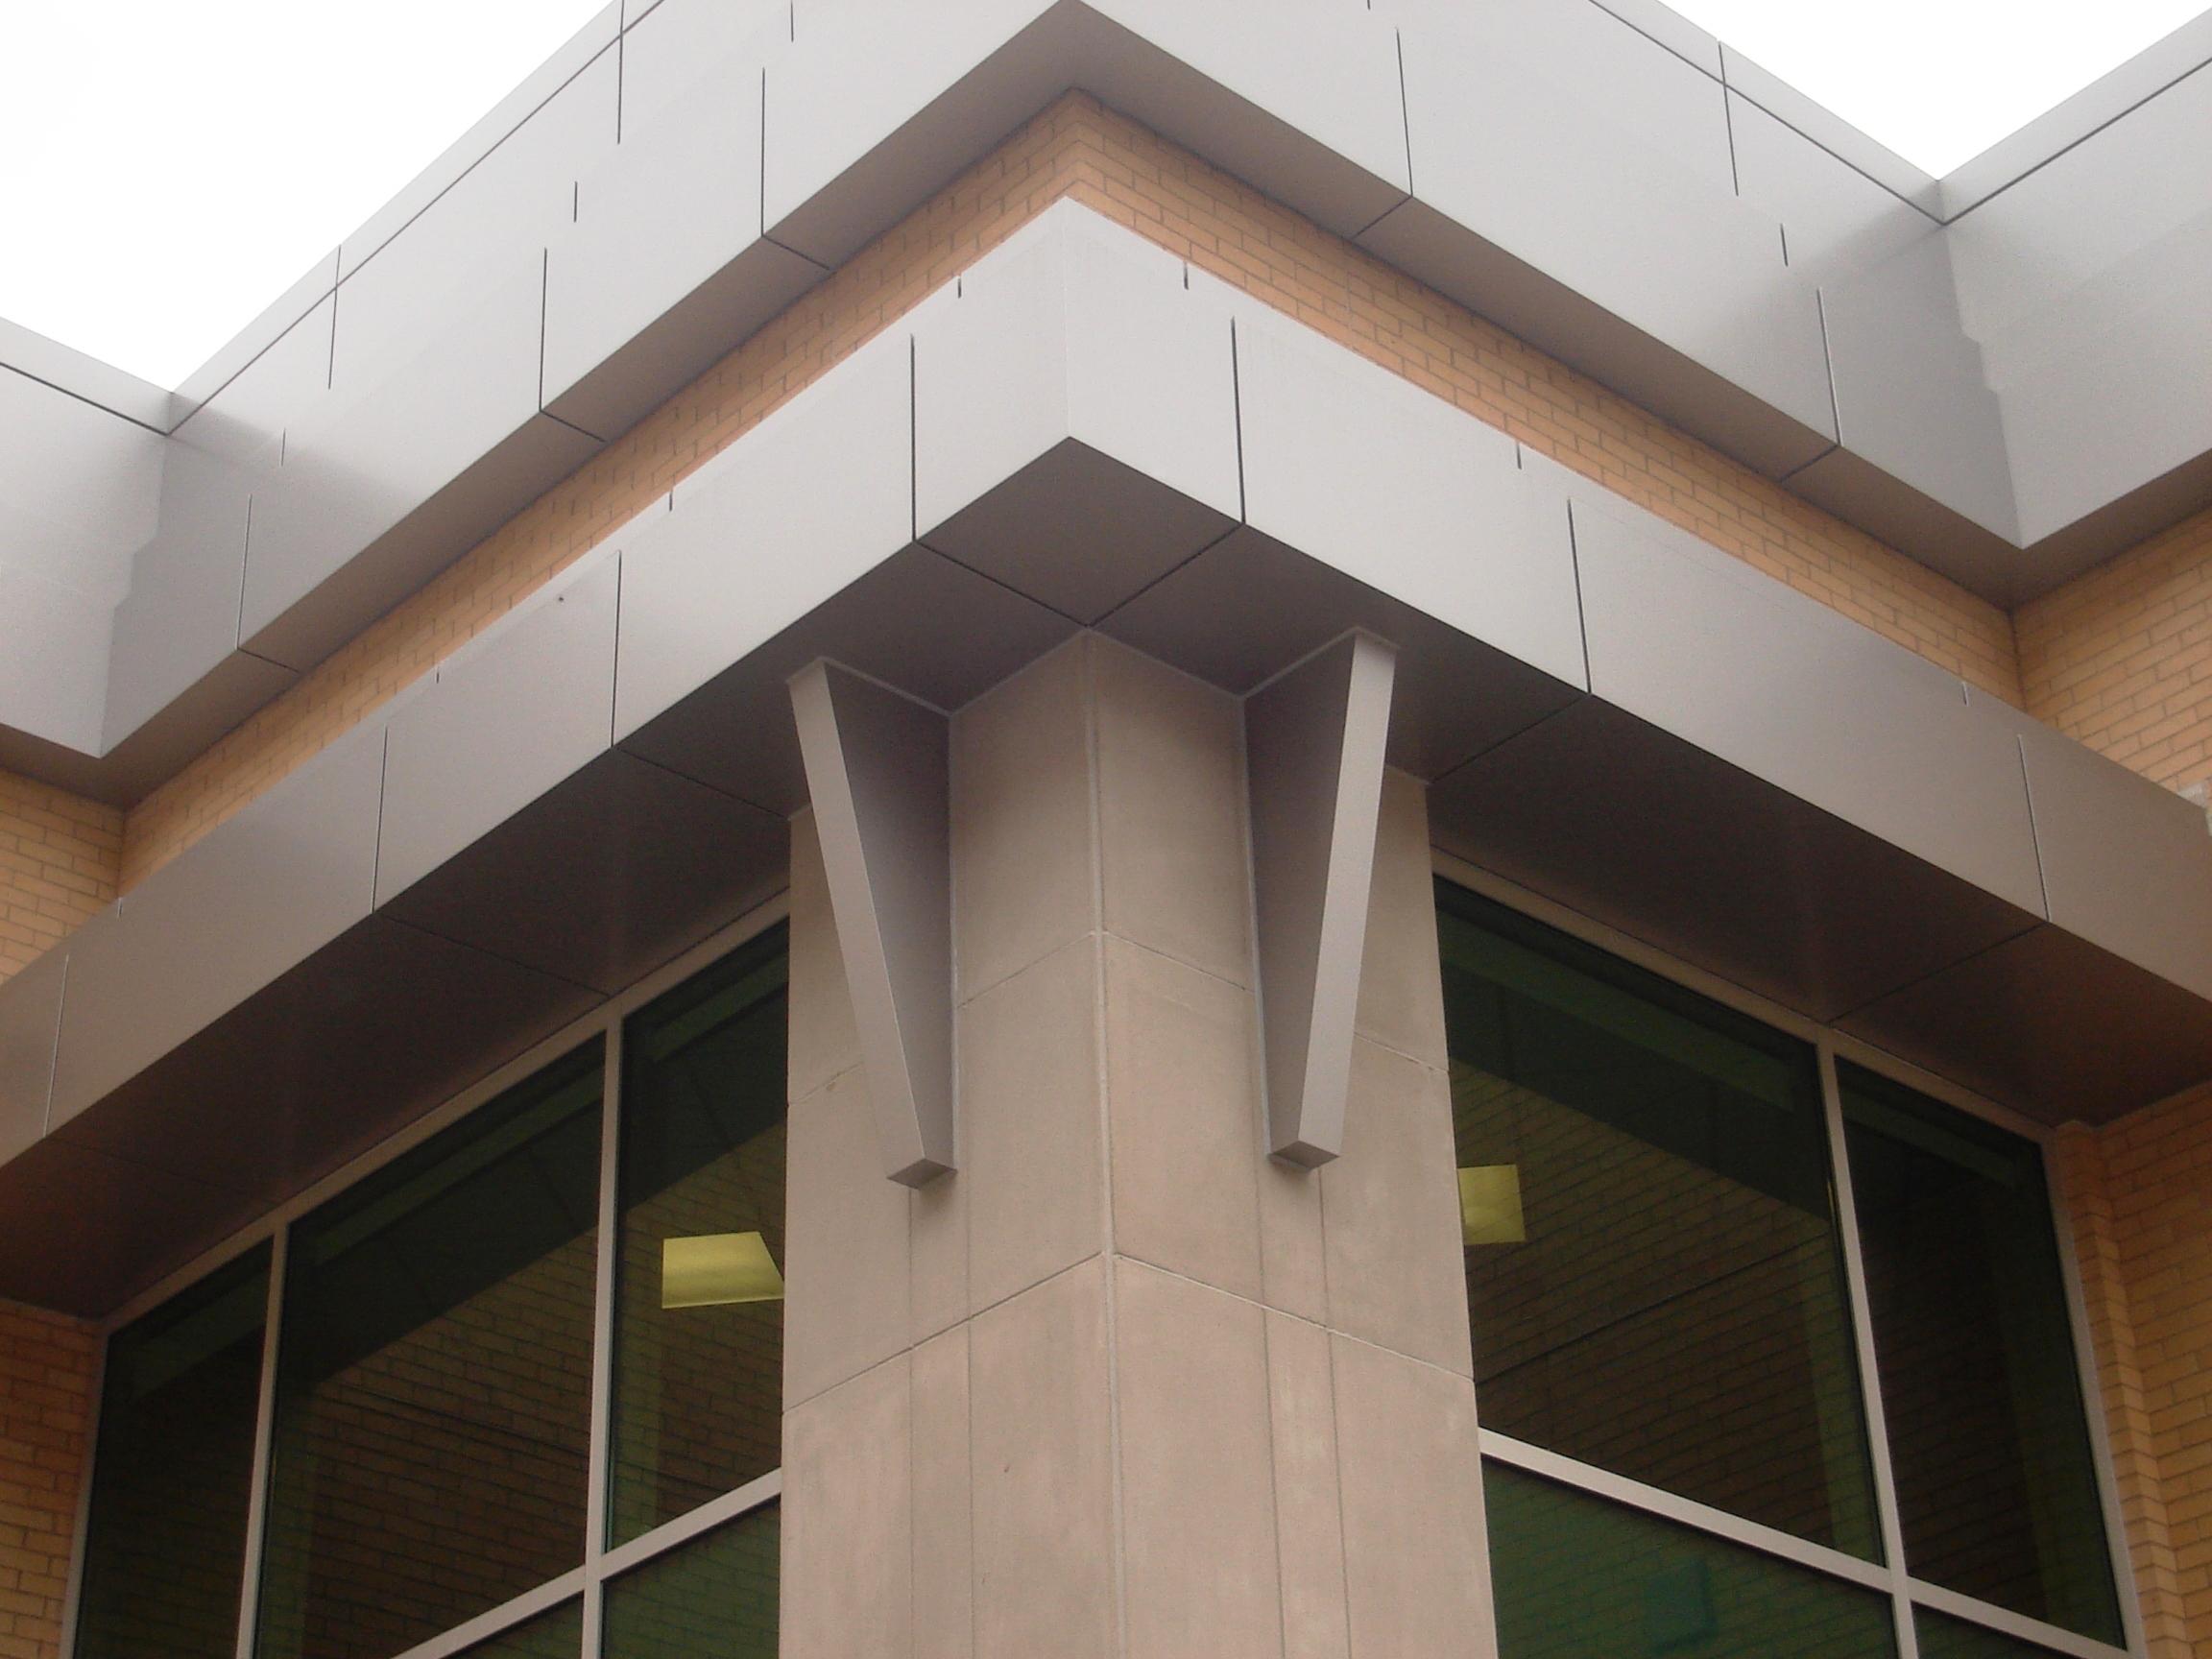 Taylorville Hospital (Taylorville)